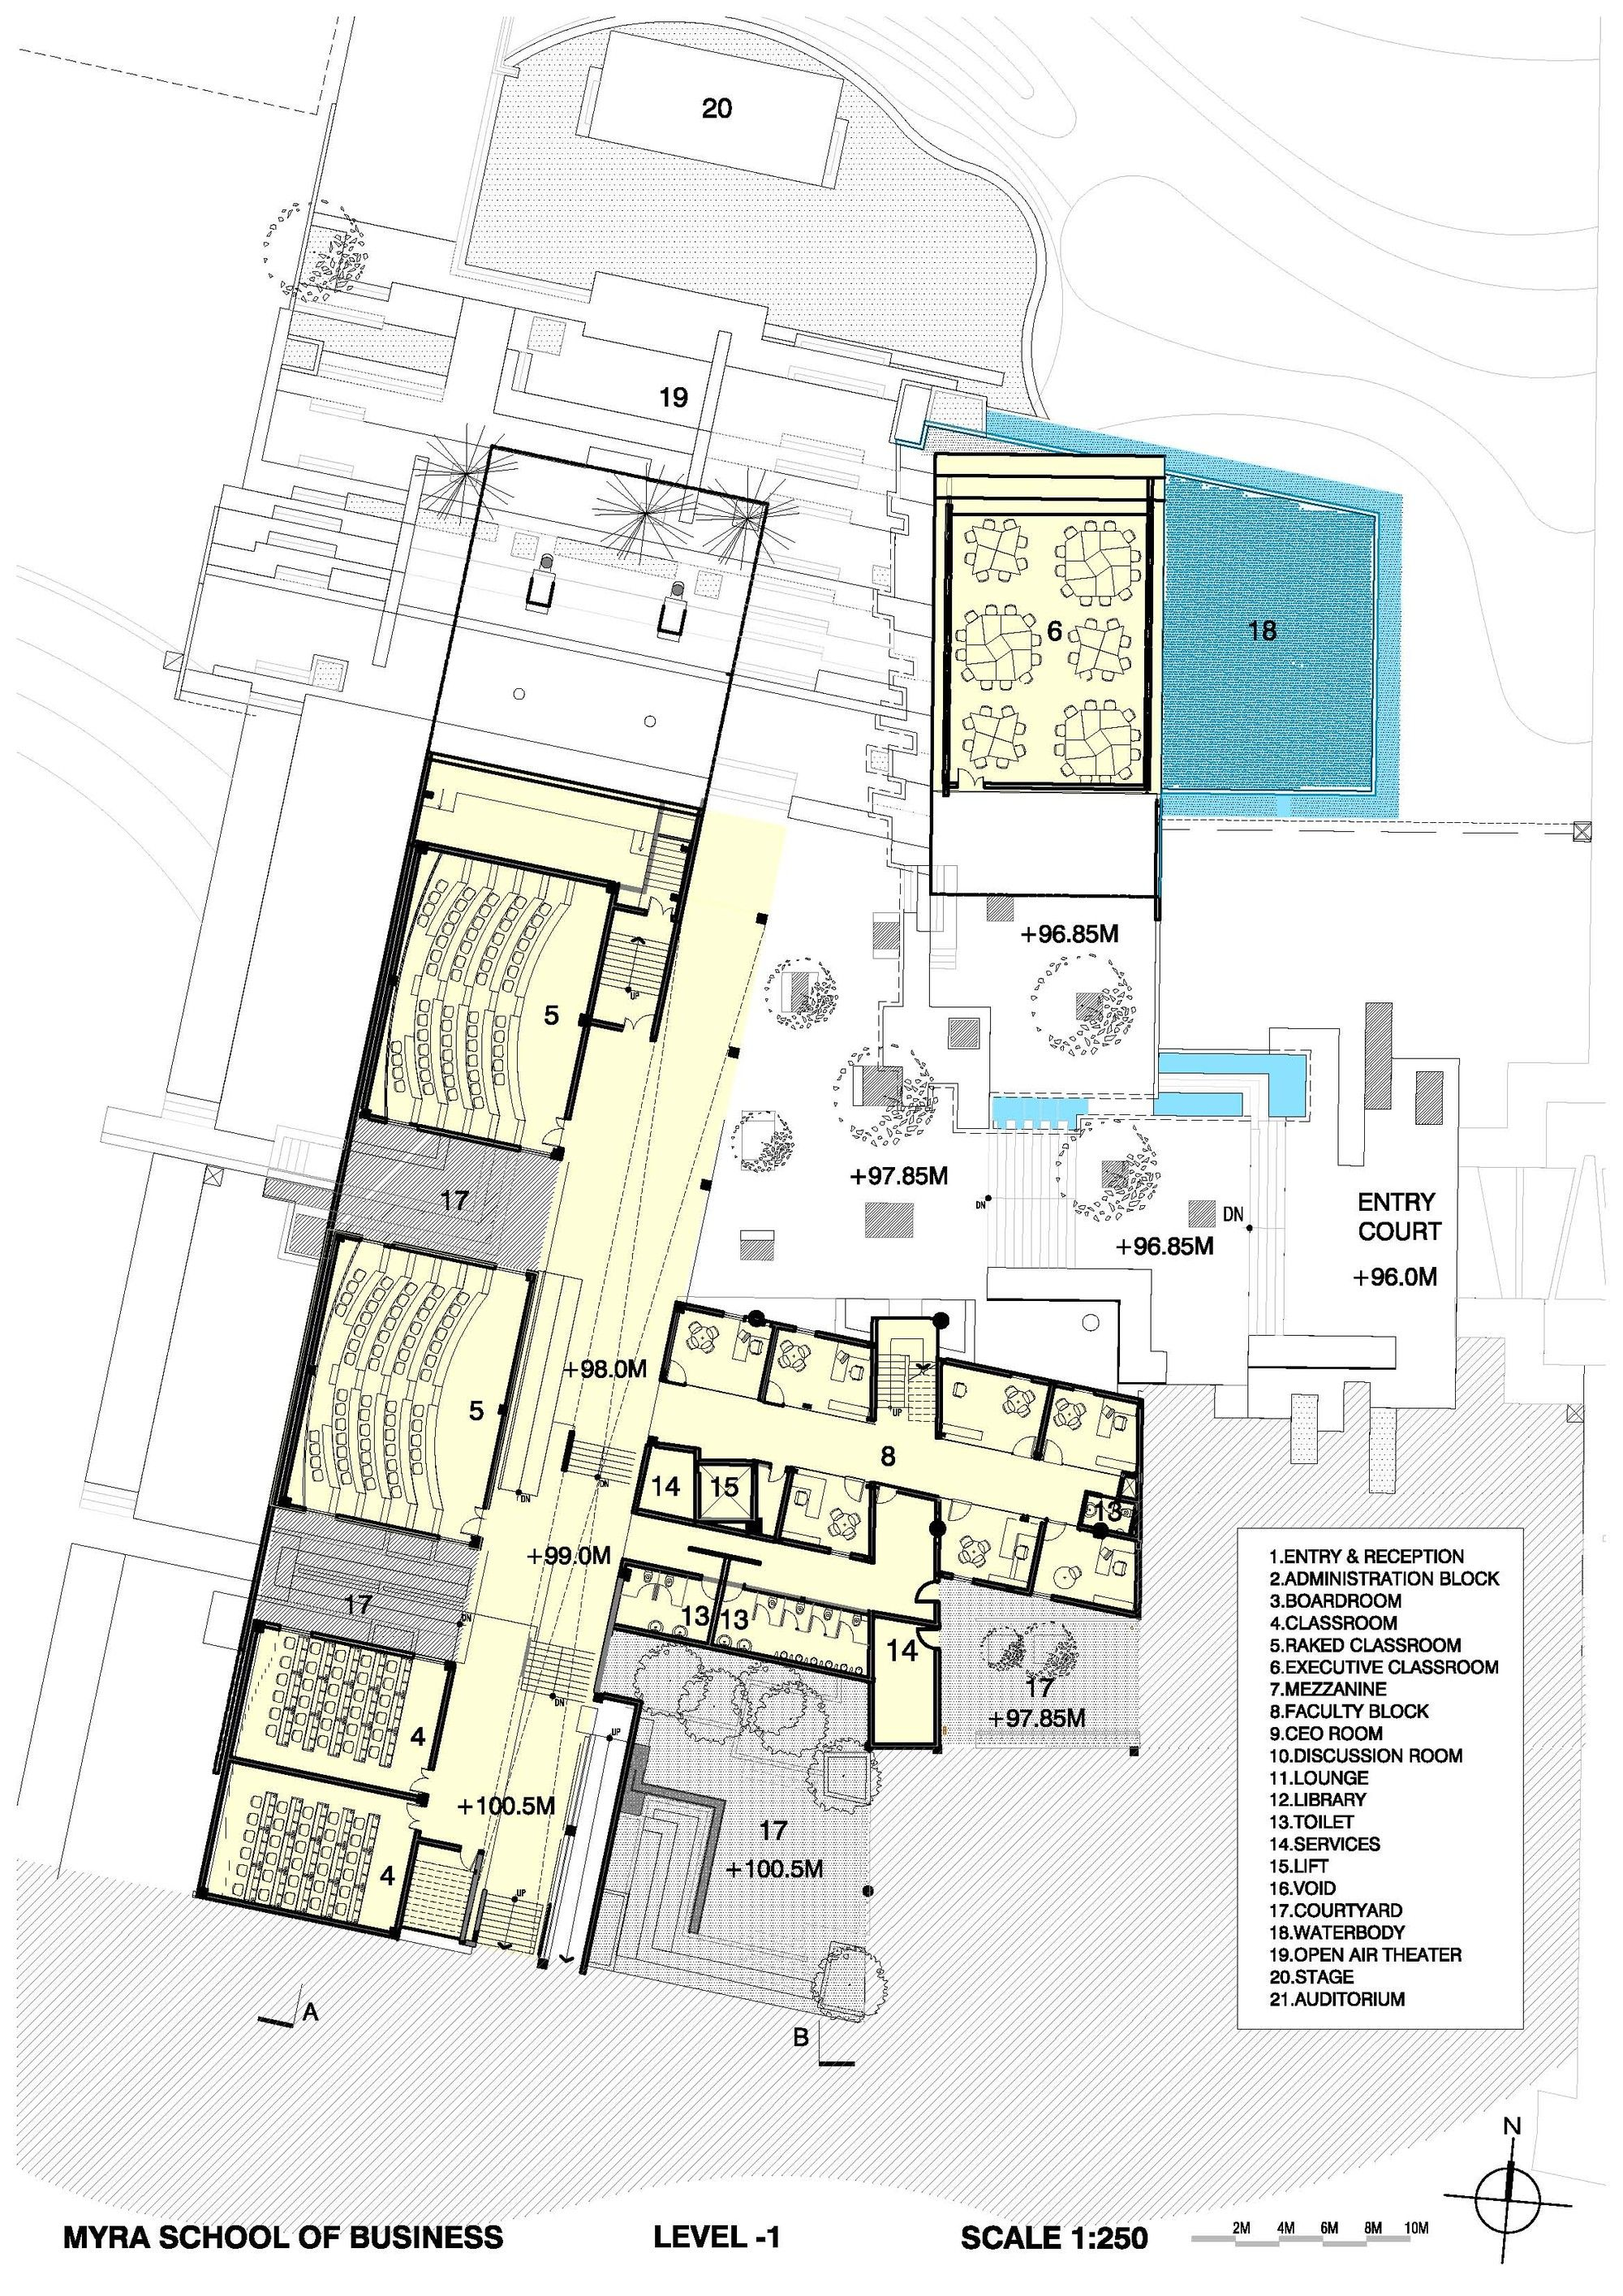 Gallery Of Myra School Of Business Architecture Paradigm 19 Business Architecture Education Architecture Architecture Building Design